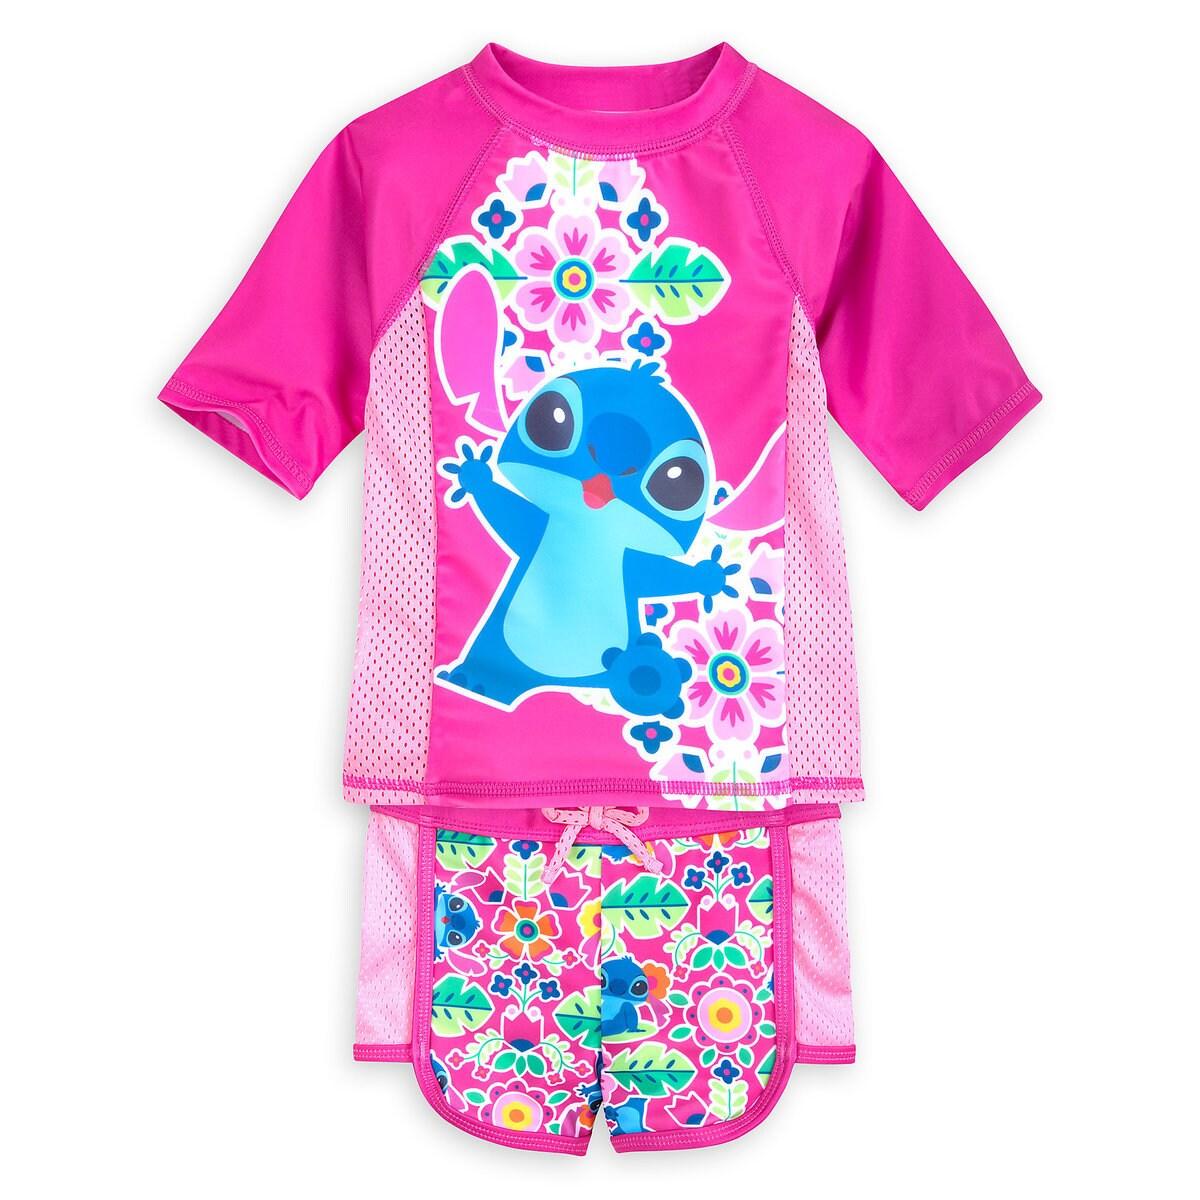 7b42435c1316a Product Image of Stitch Rash Guard Swim Set for Girls # 1